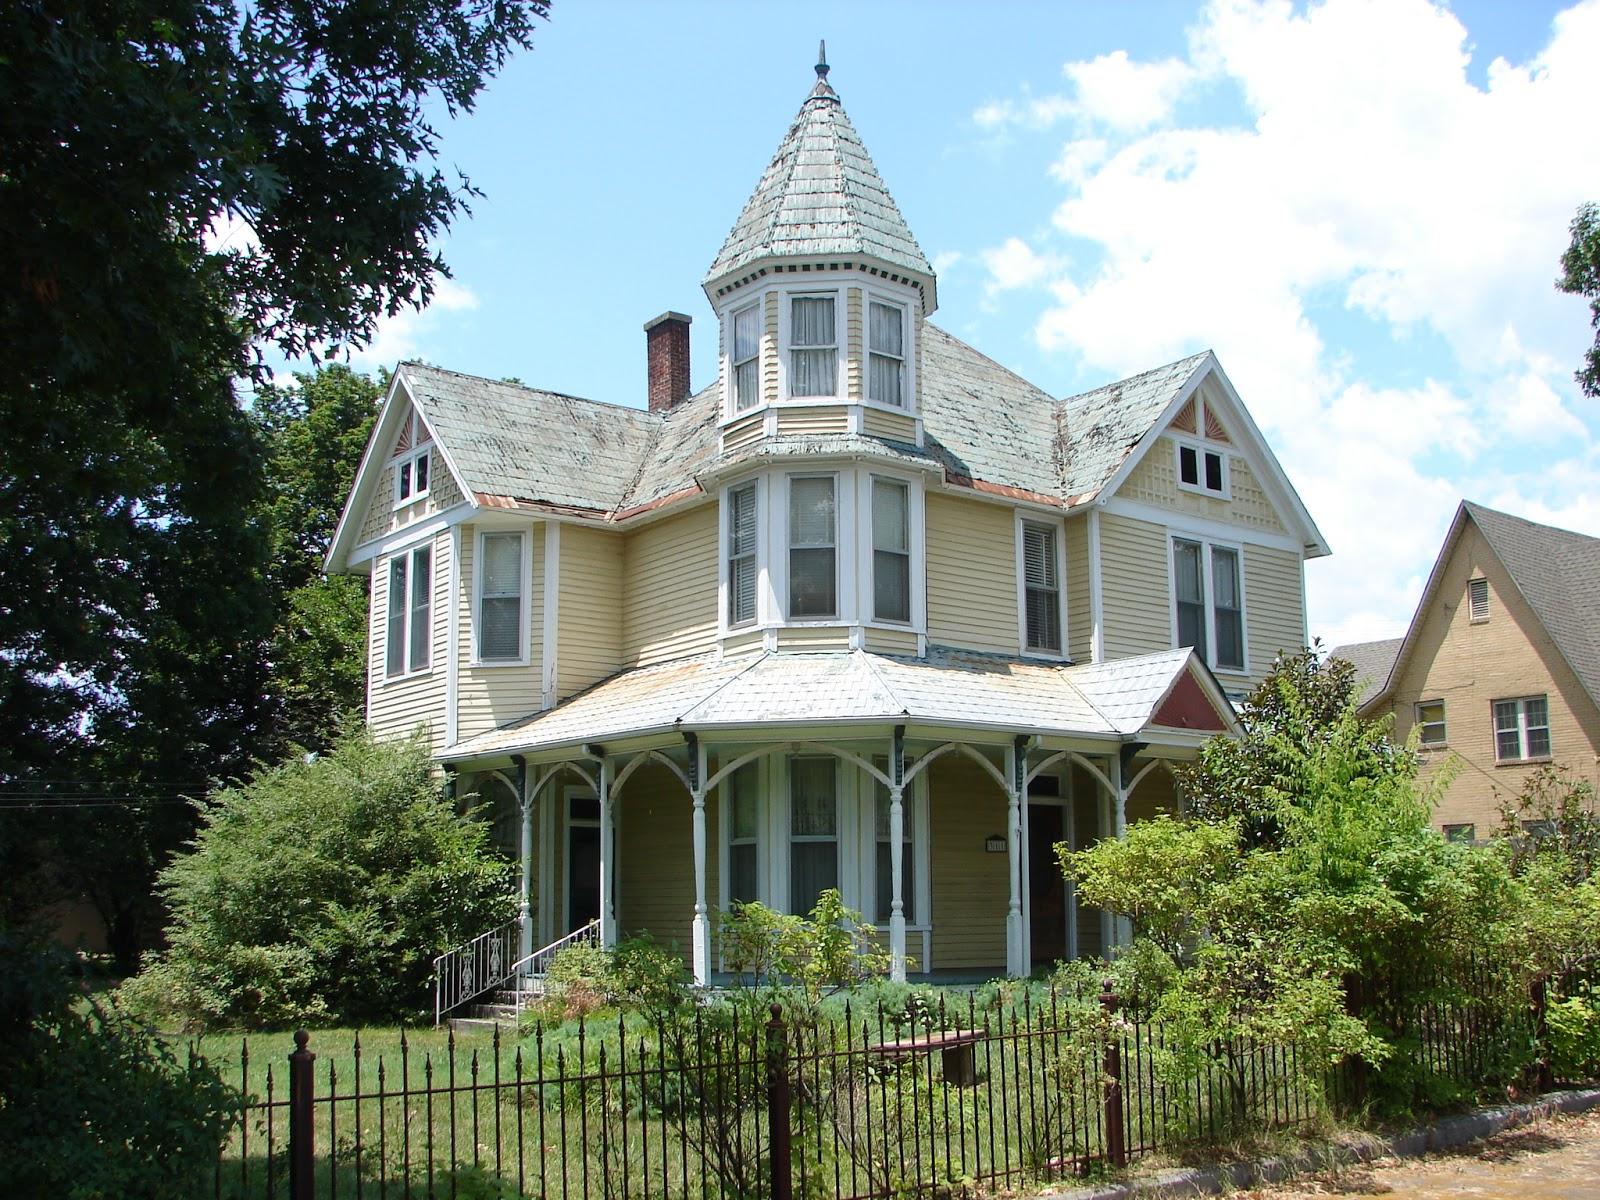 victorian style home victorian style home victorian style pix victorian style homes